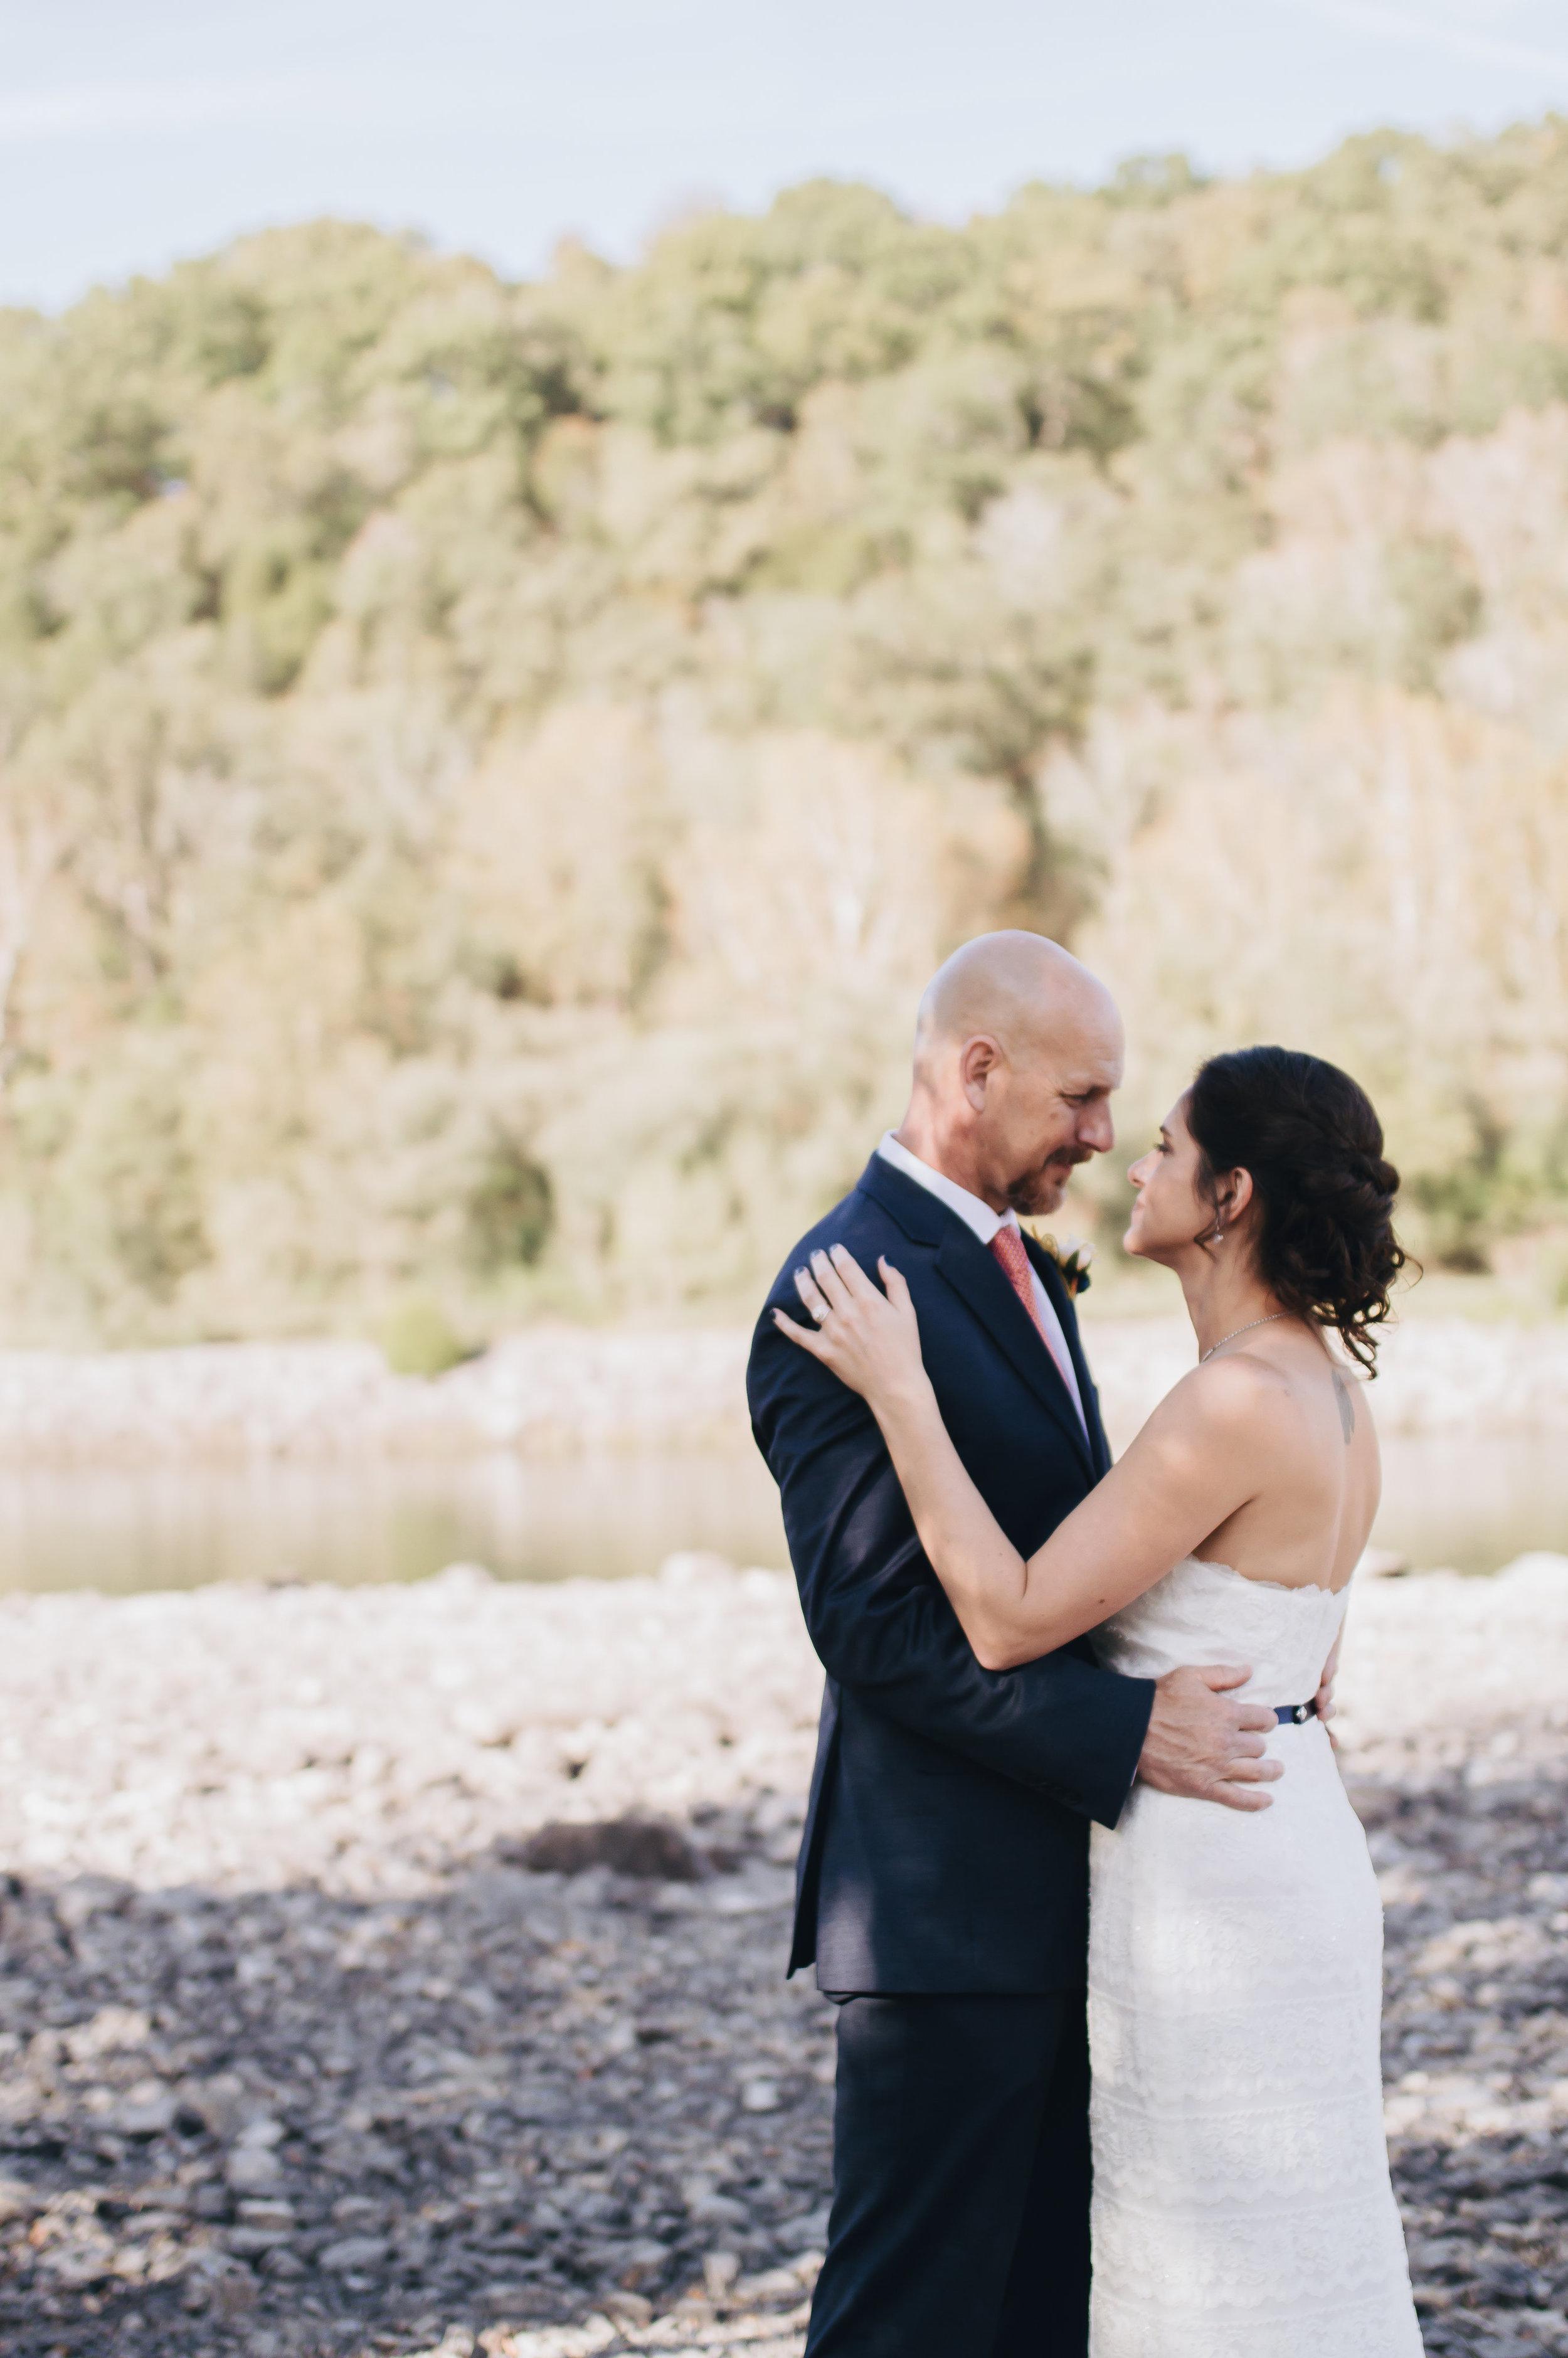 Crystal and Michael Wedding - EDITS-0142.jpg